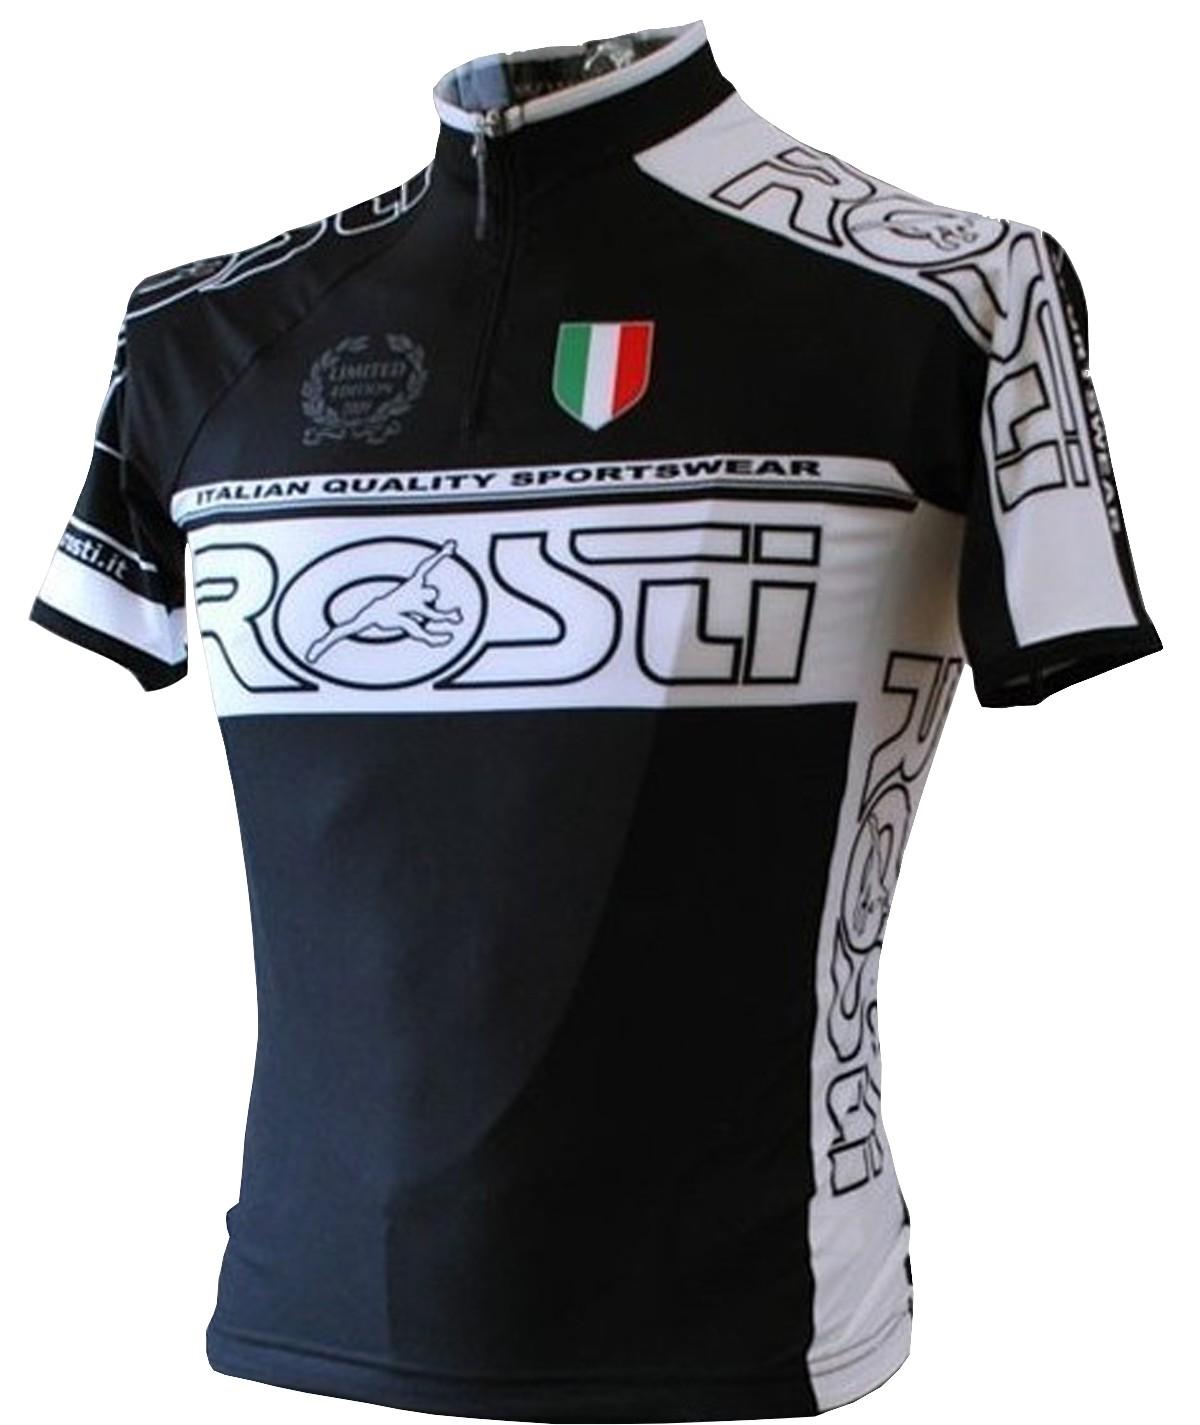 Maillot Rosti Black Edition